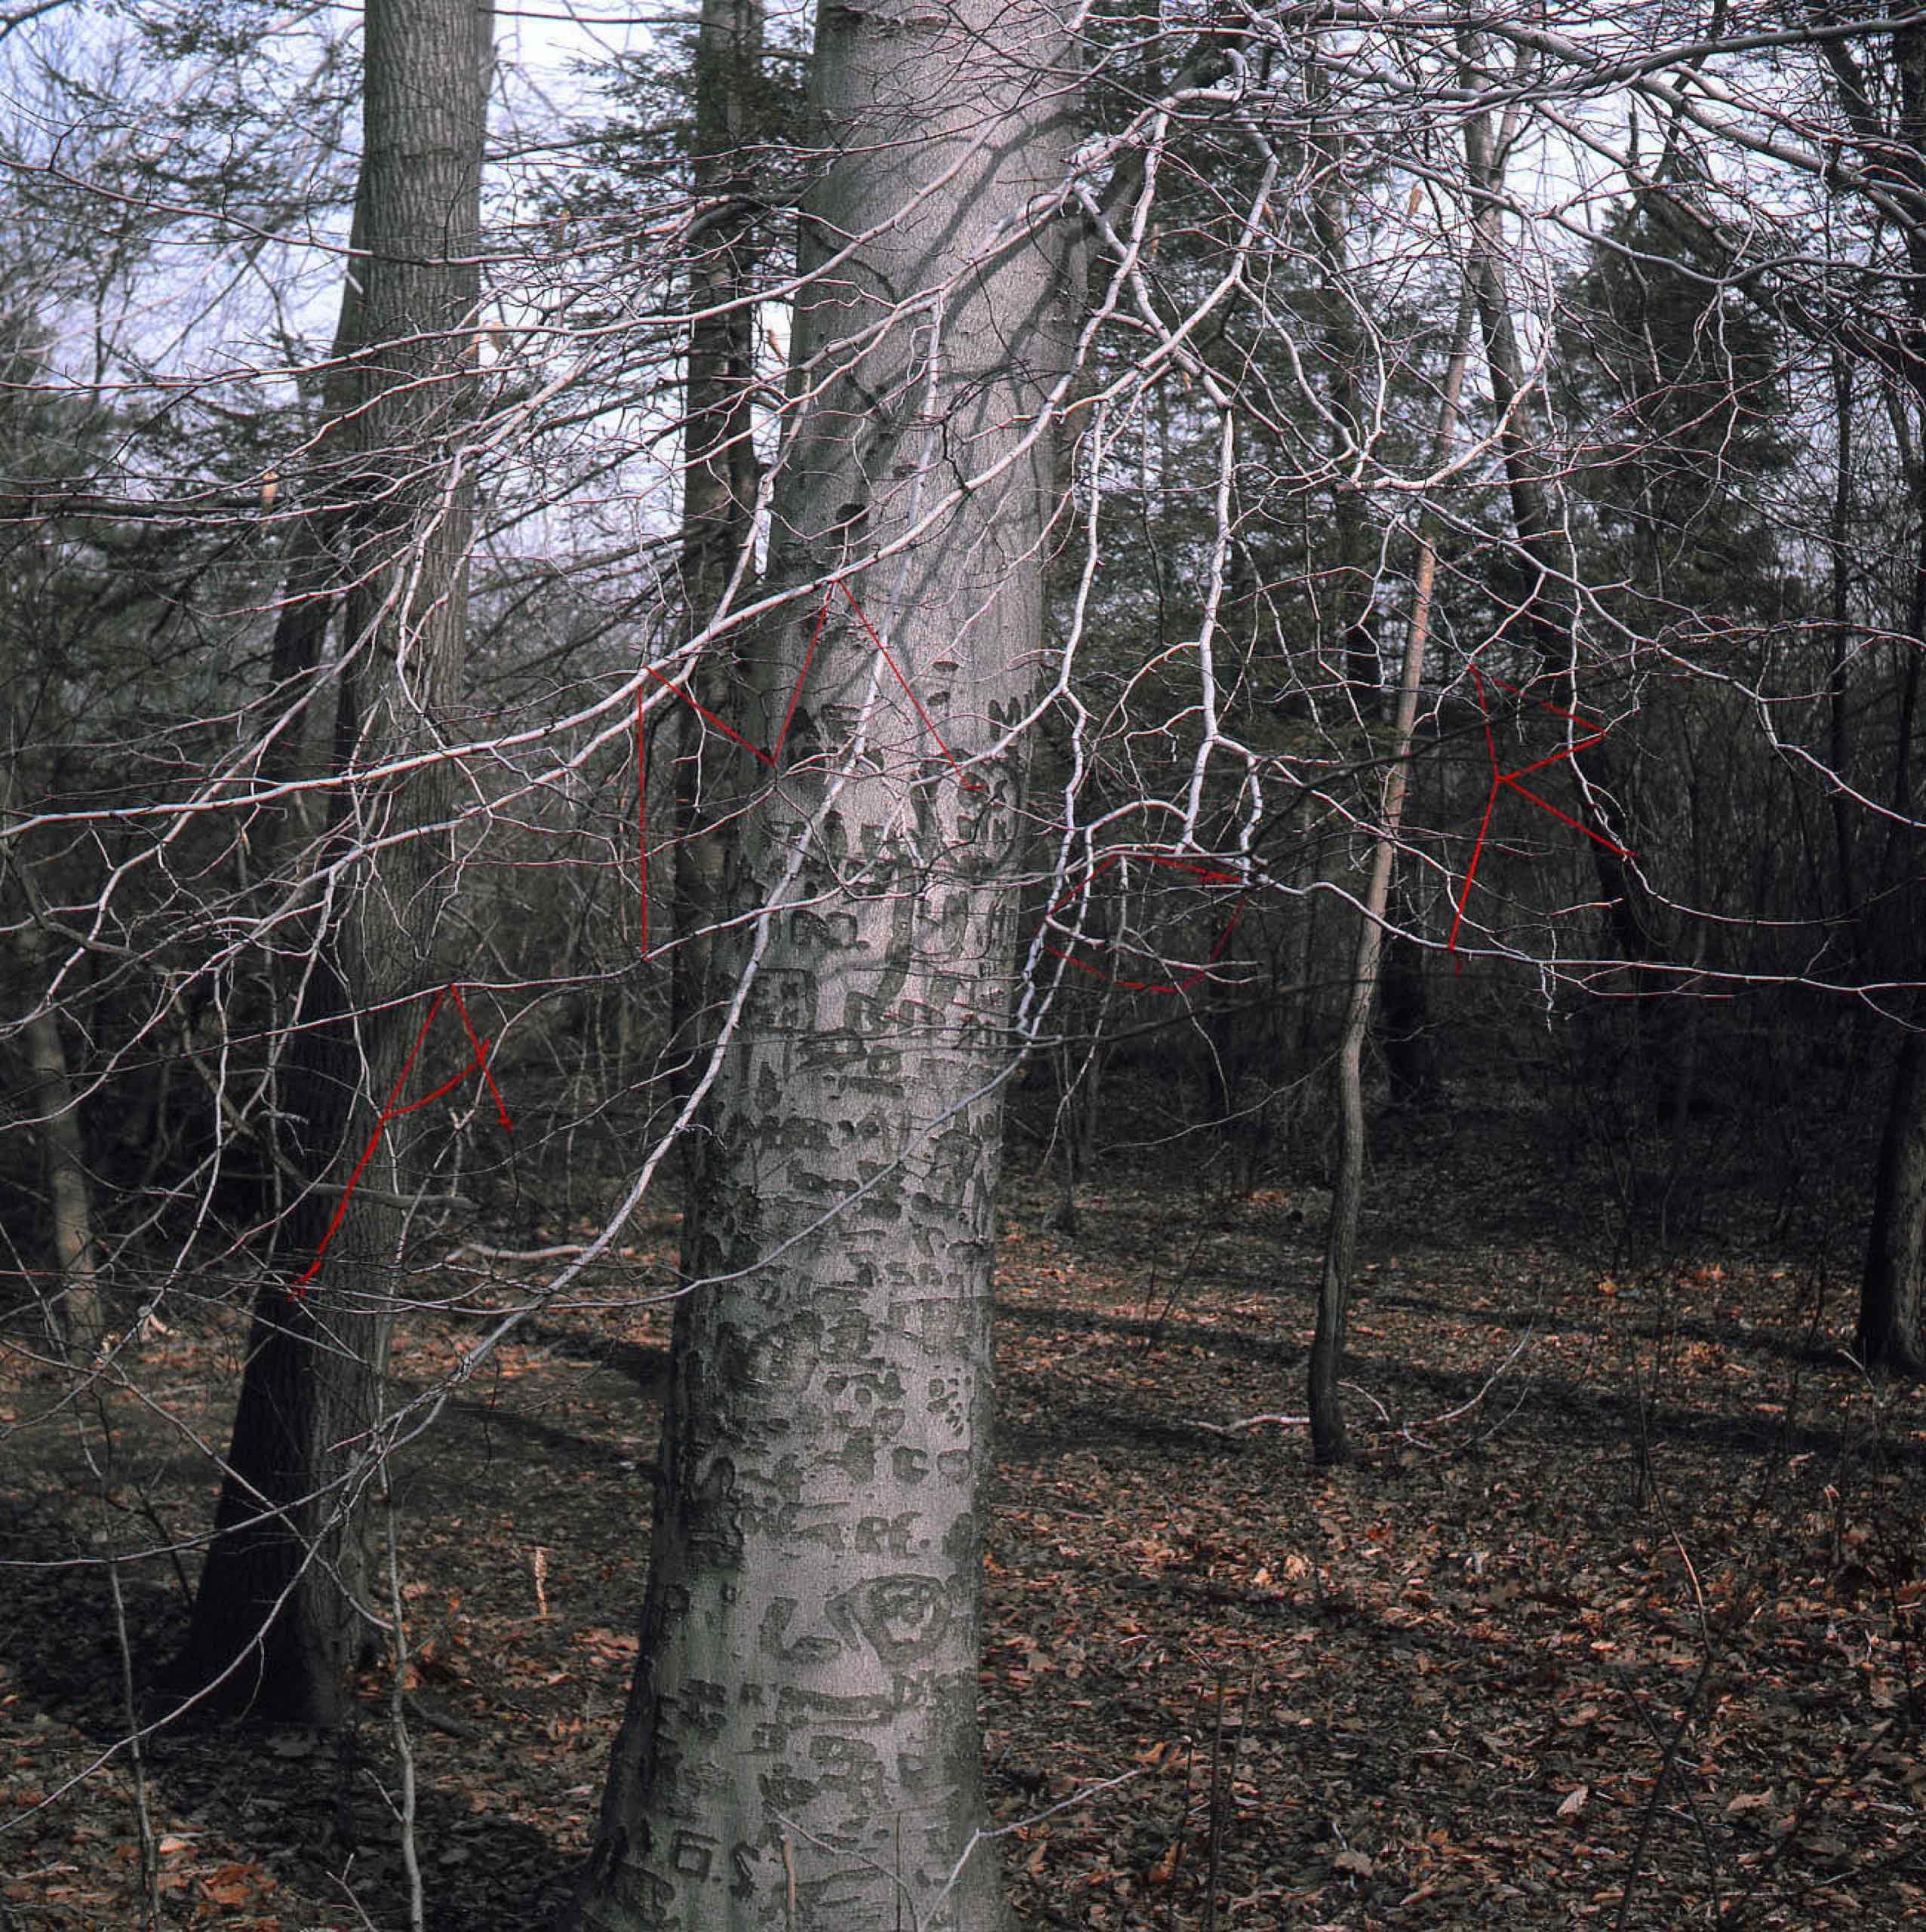 Cecilia Vicuña, Sidewalk Forests, 1981, Series of 4 digital prints